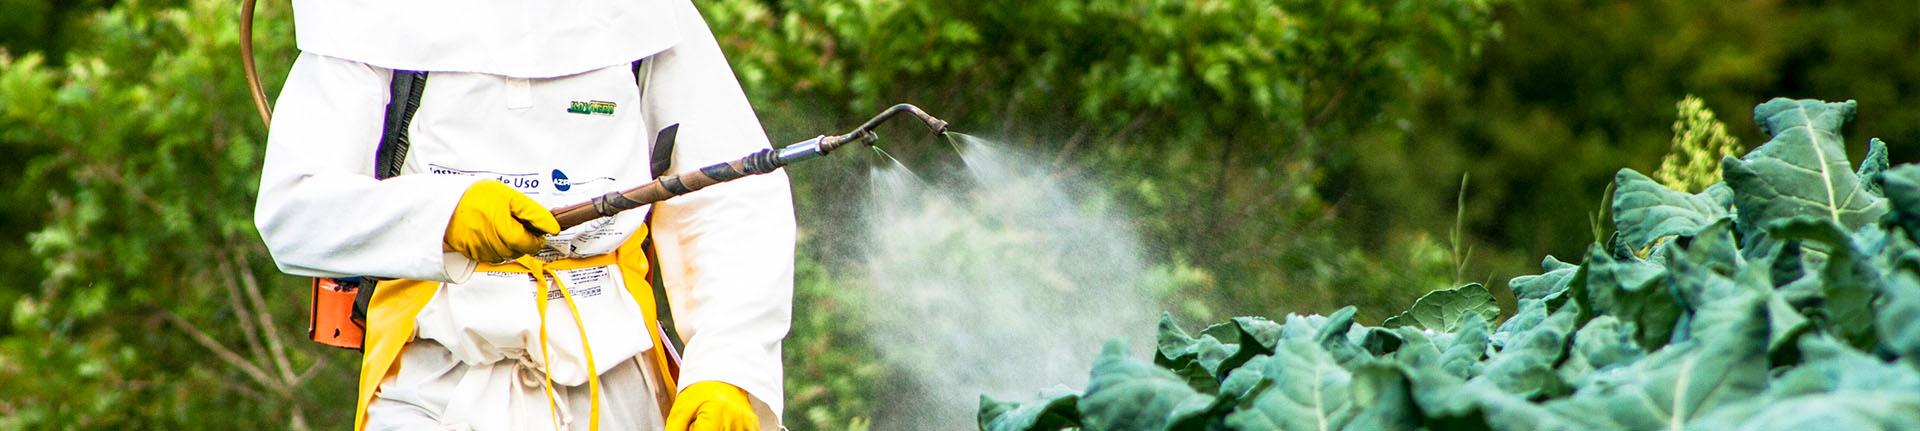 Agrotóxicos, o perigo de consumi-los e como eliminá-los